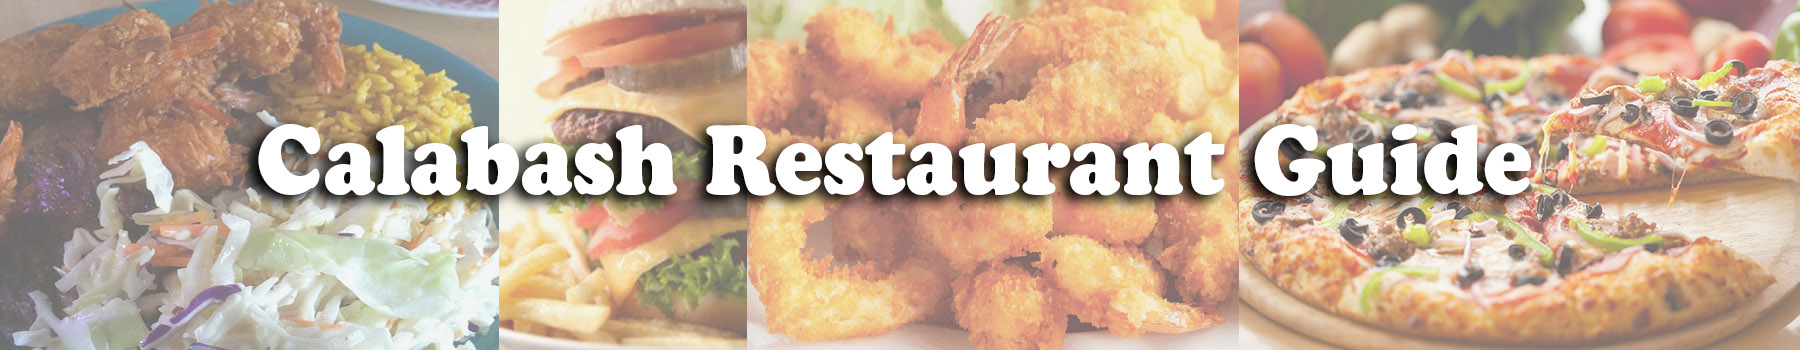 Calabash NC Restaurant Guide